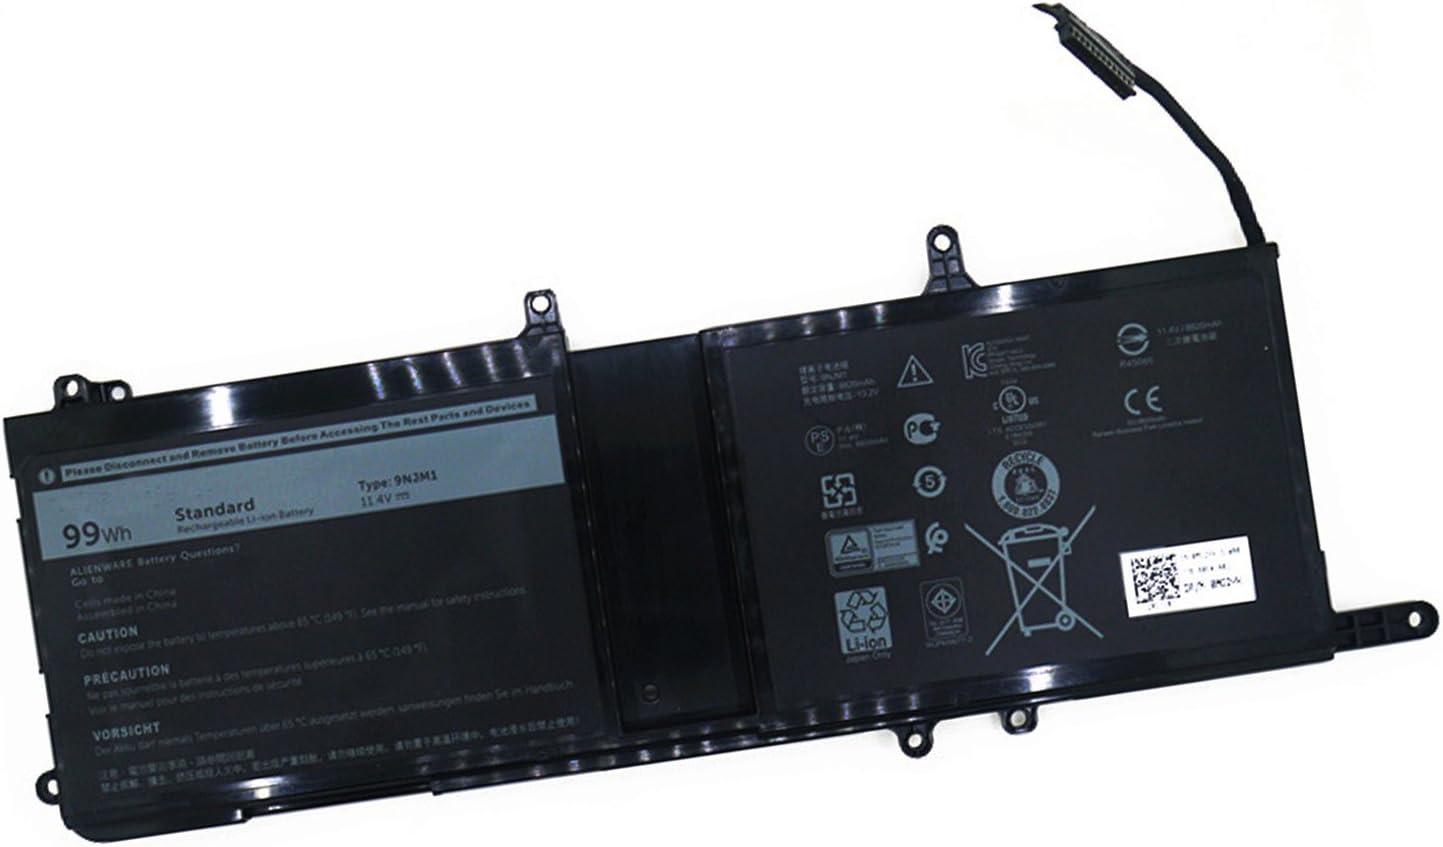 Dentsing 9NJM1 Battery for Dell Alienware 15 R3 17 R4 99Wh 11.4V 01D82